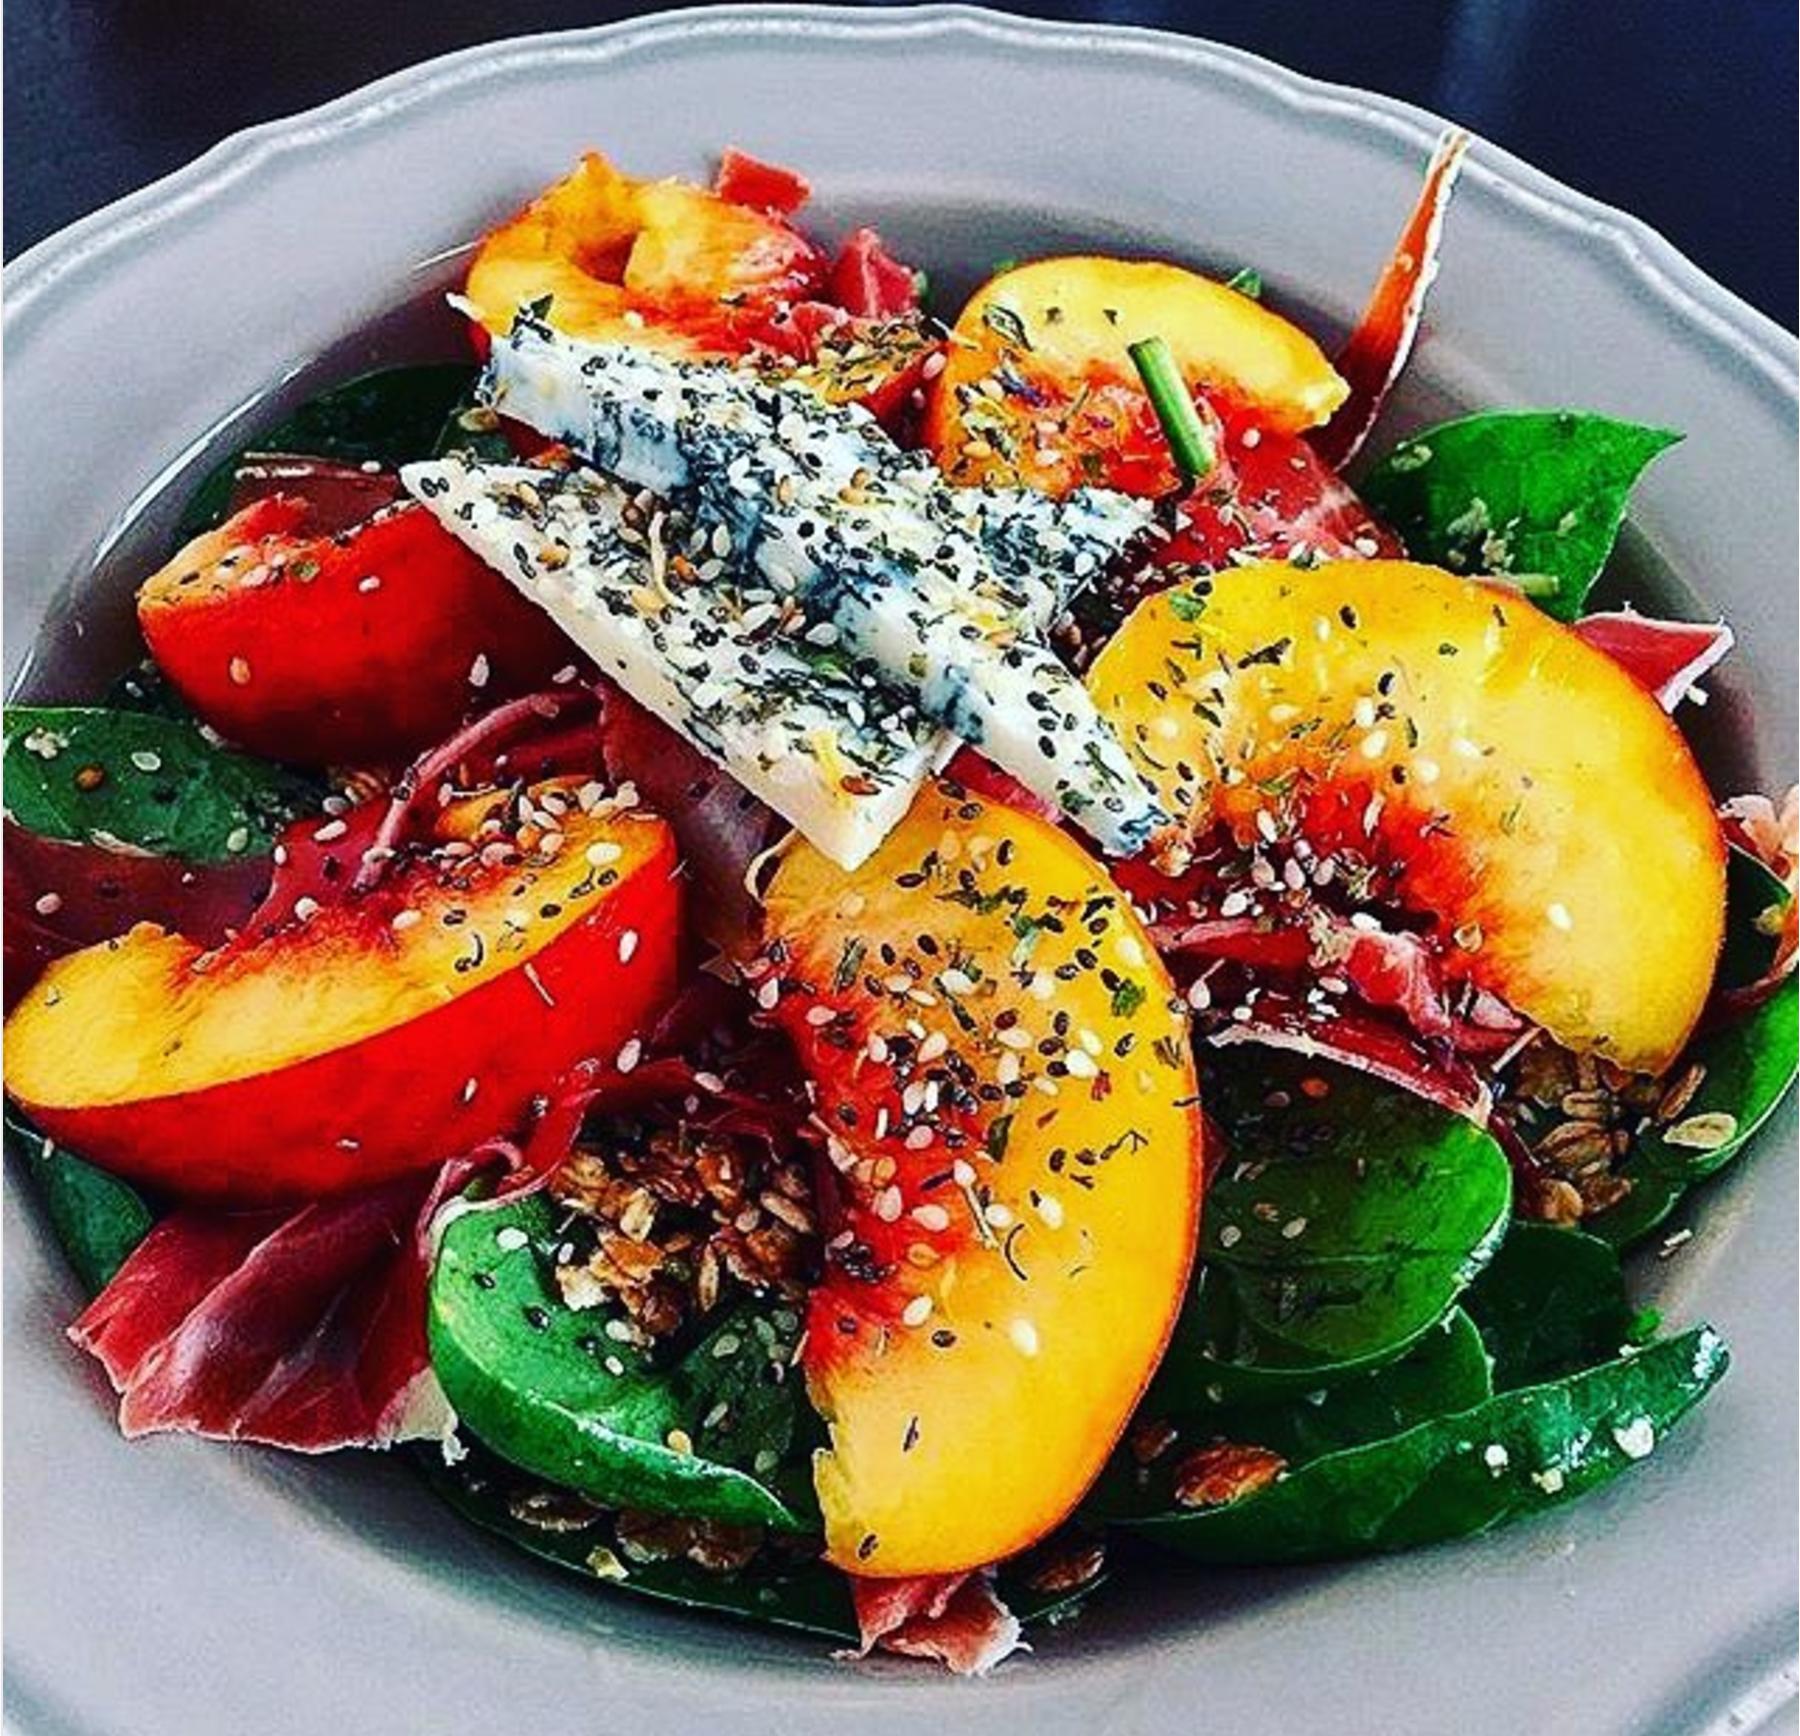 salade-huguette-maison-healthy